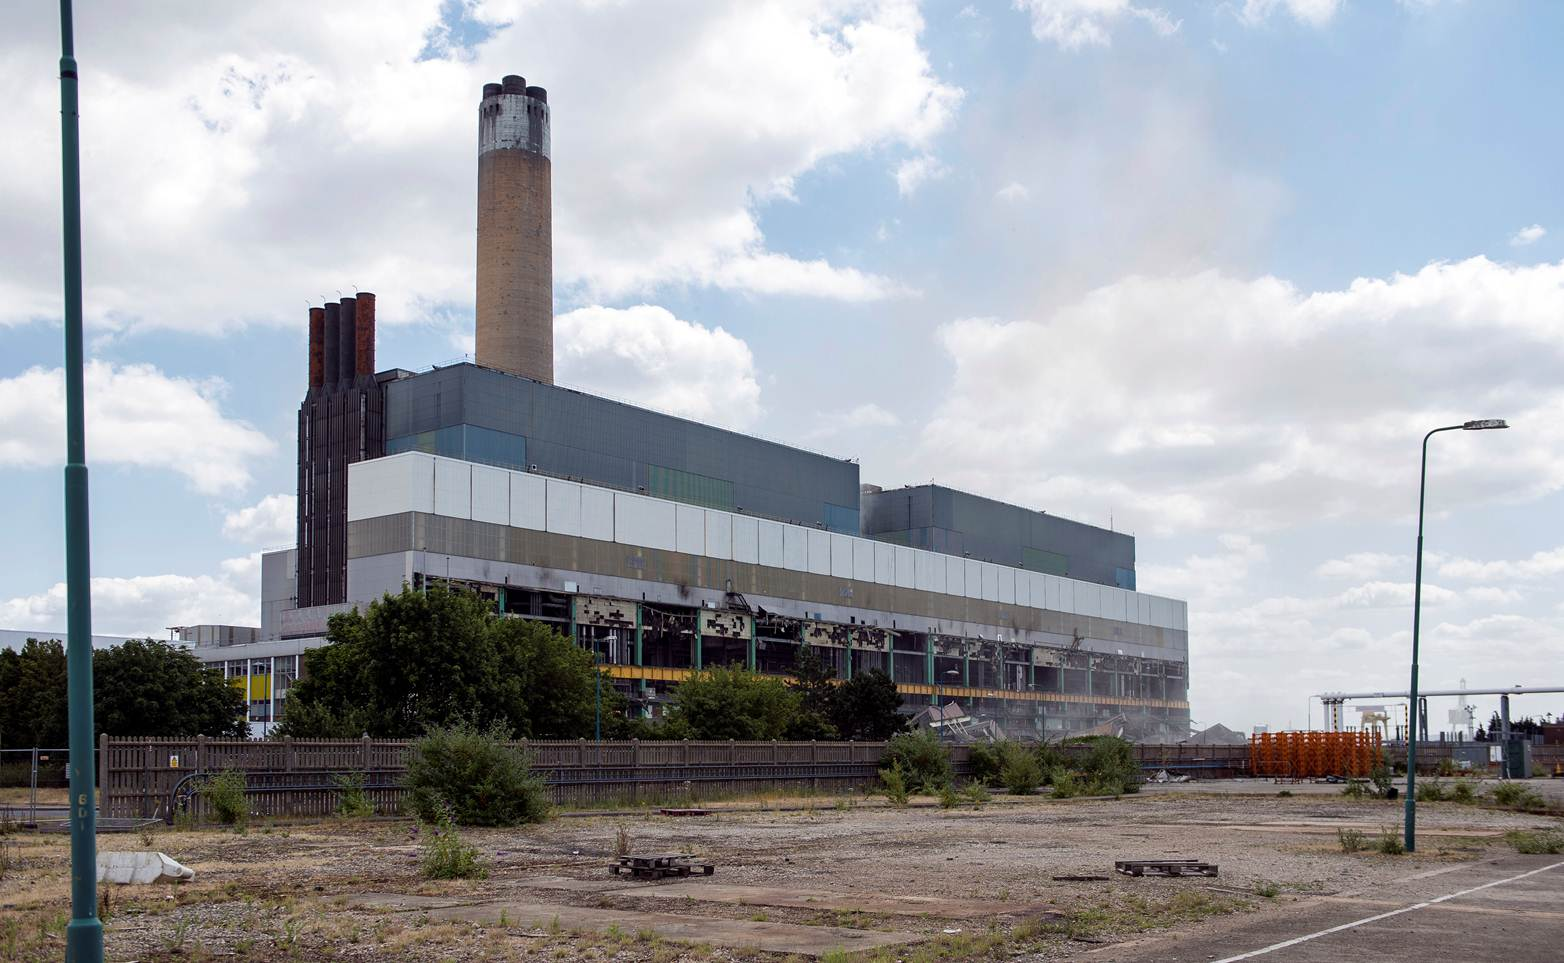 Demolition of Kingsnorth power station